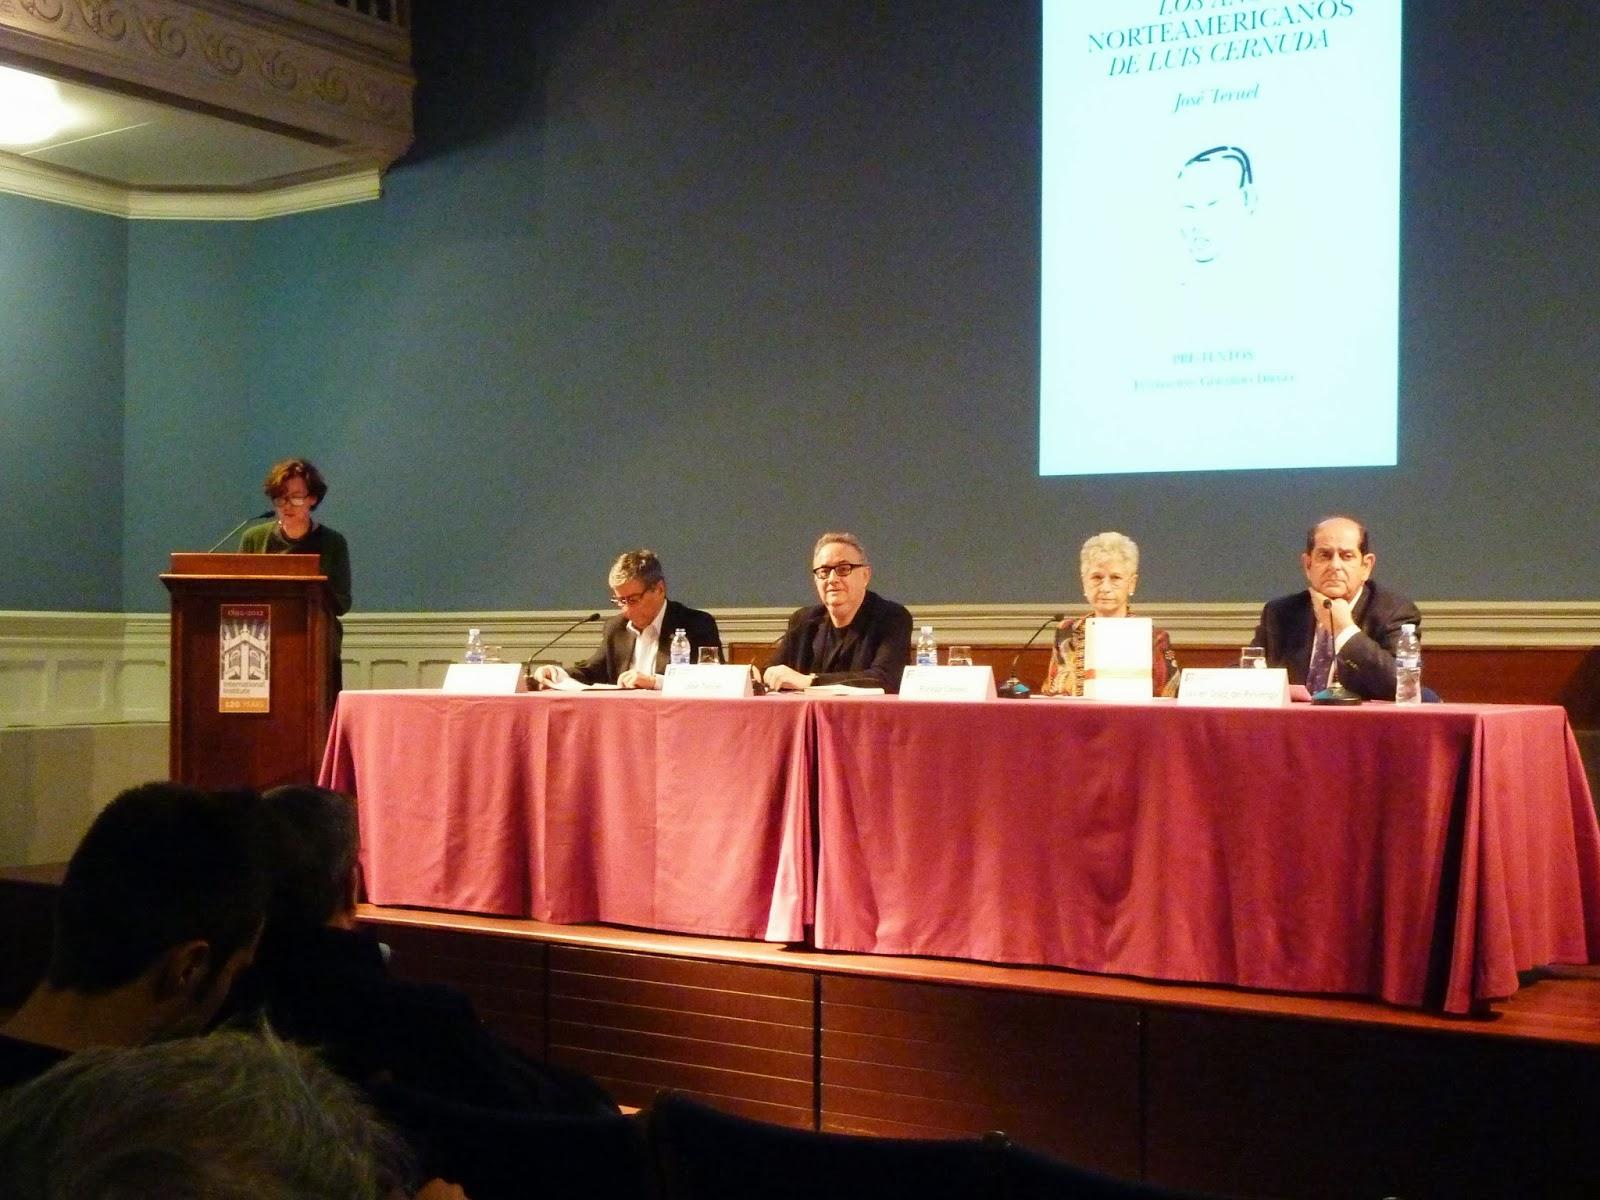 José Teruel - Luis Cernuda - Literaturas Hispánicas